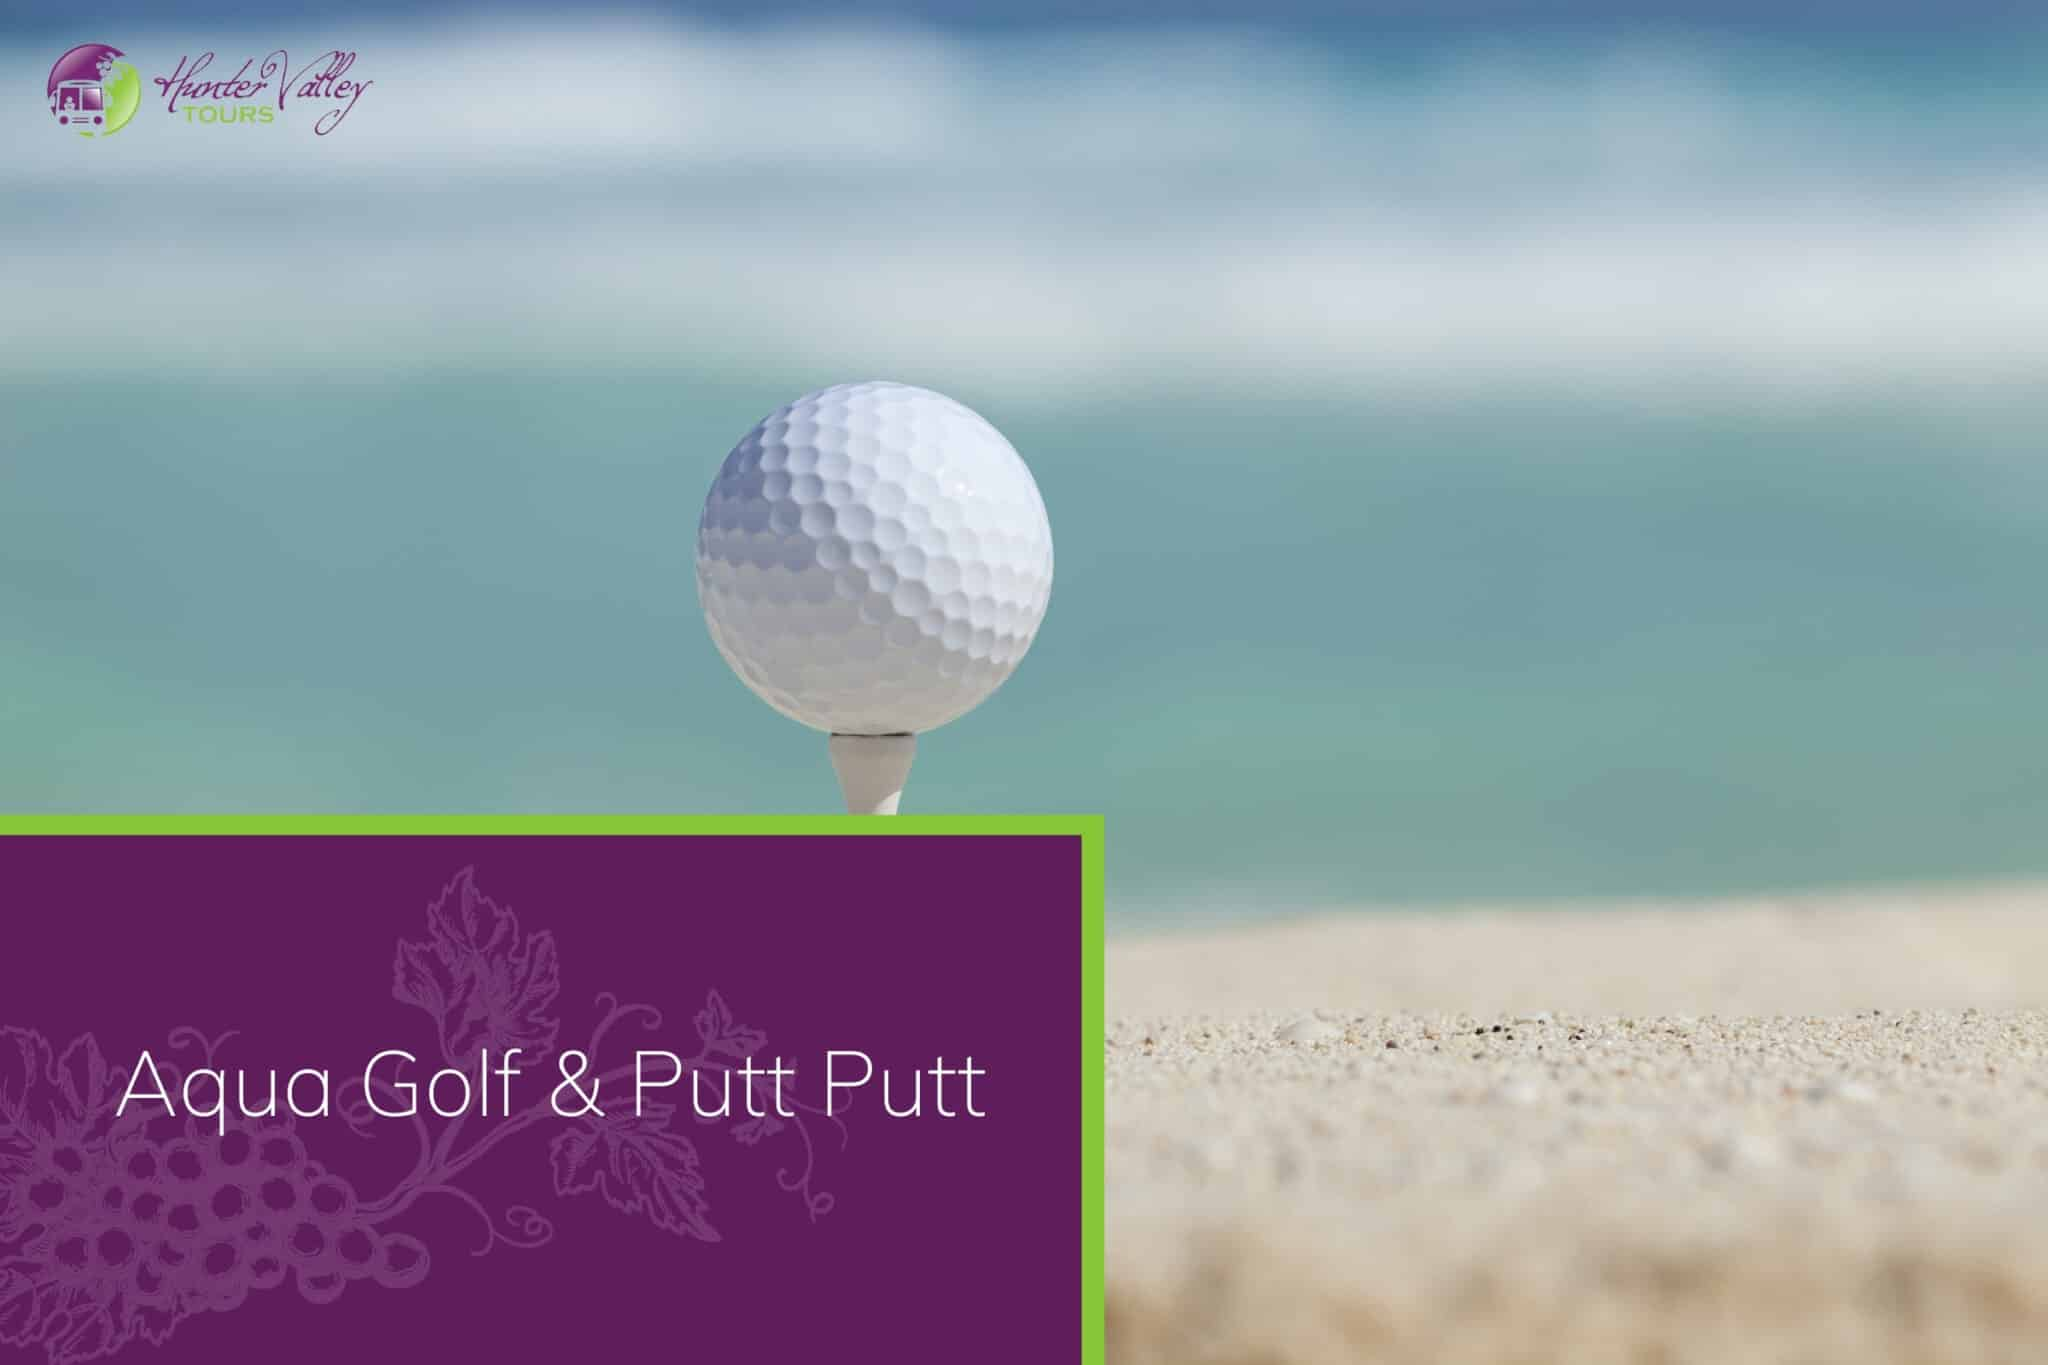 Aqua Golf & Putt Putt